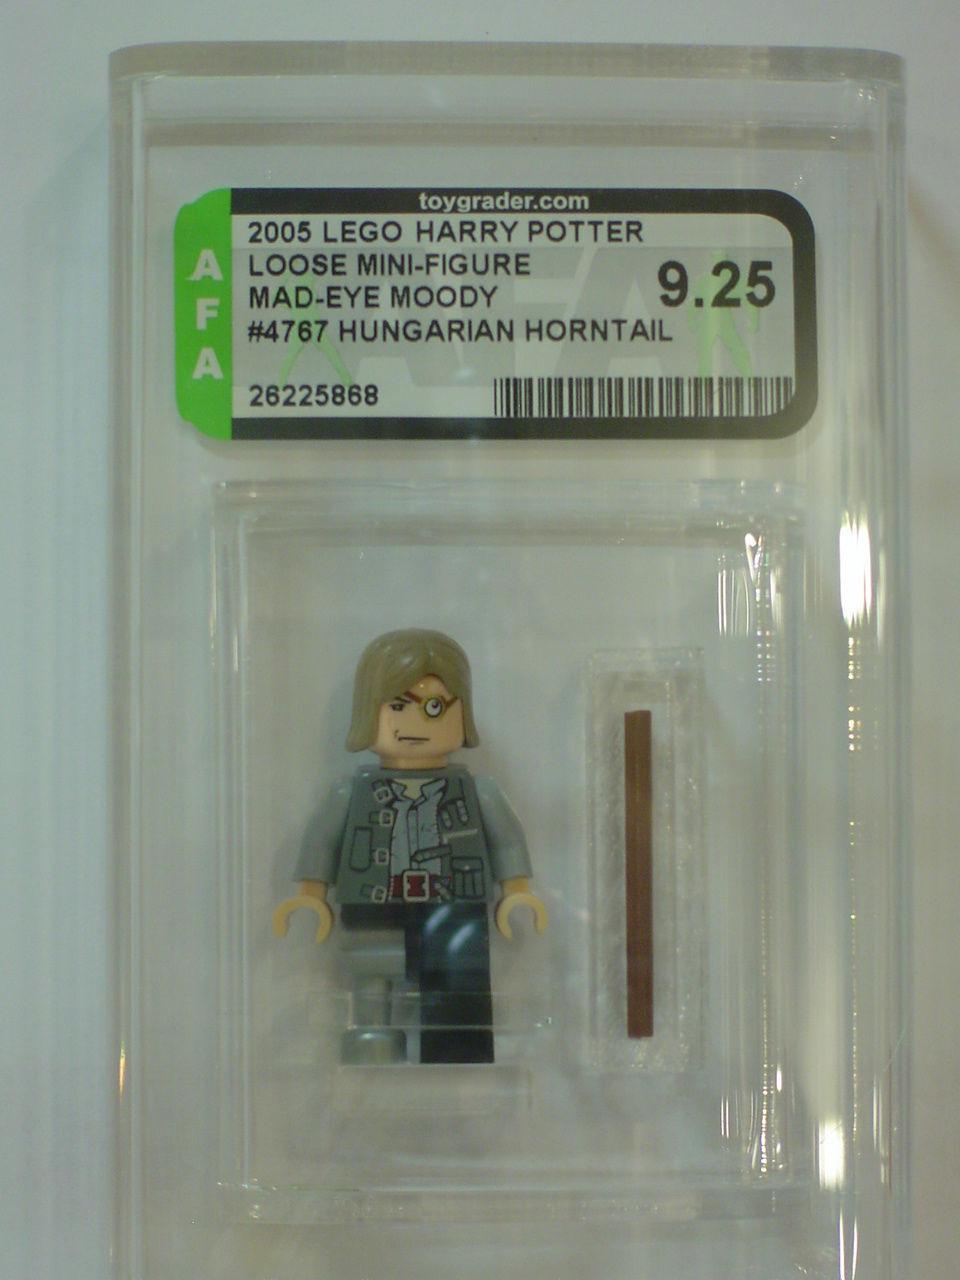 Lego 2005 Harry Potter Mad-Eye Moody Minifigure  GRADED AFA 9.25 - NEW